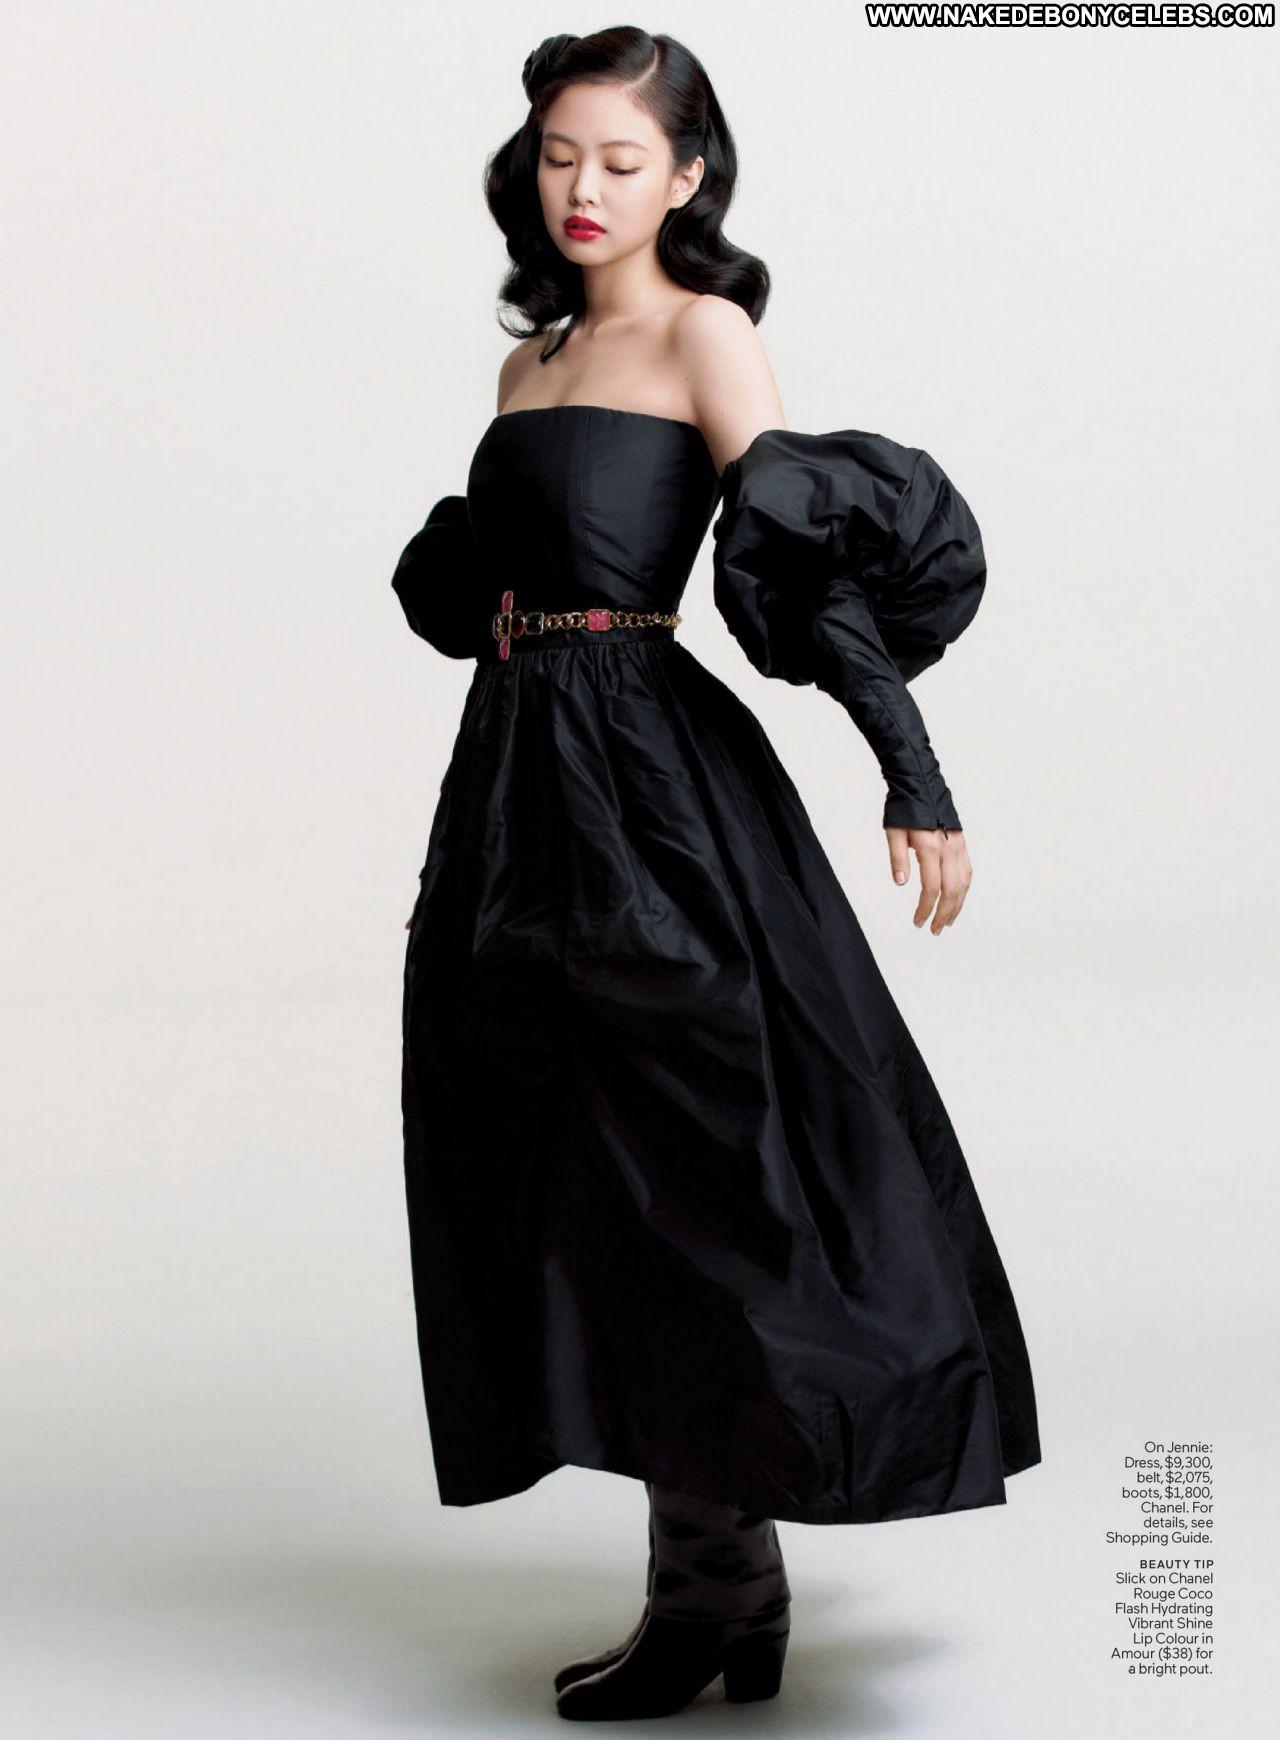 Celebrity Modeling: Natasha Belle High Quality Pics